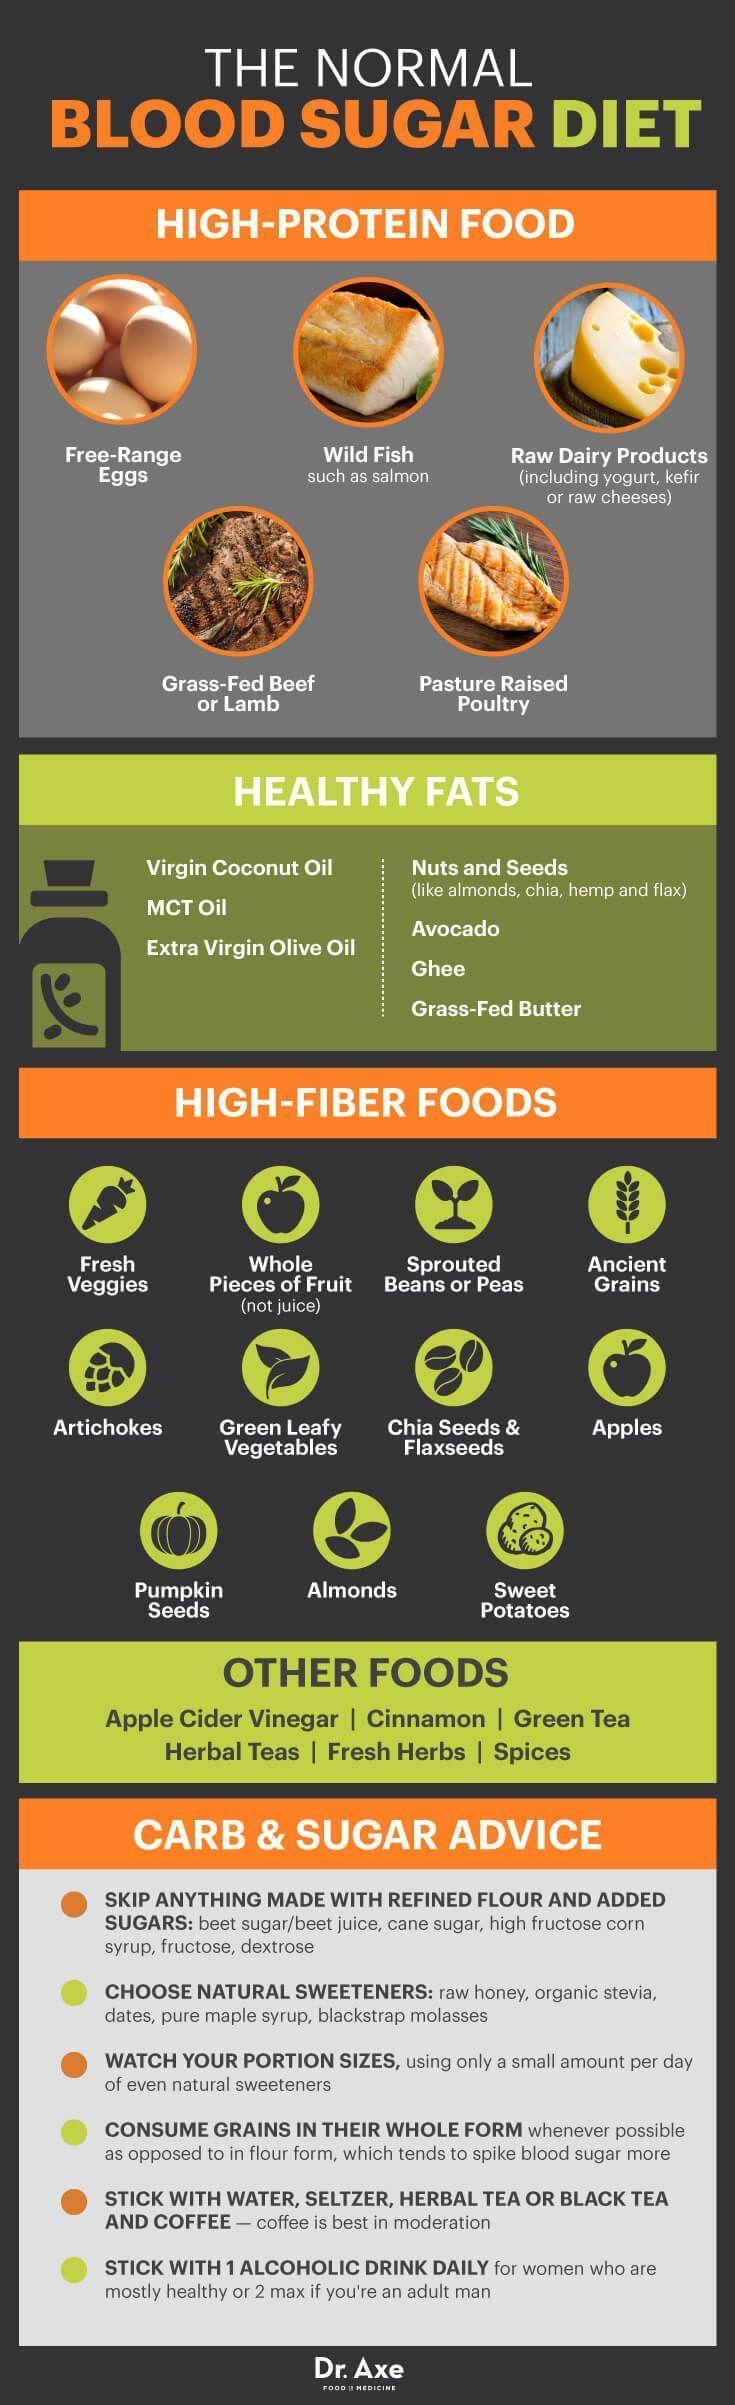 Normal blood sugar diet - Dr. Axe http://www.draxe.com #health #holistic #natural